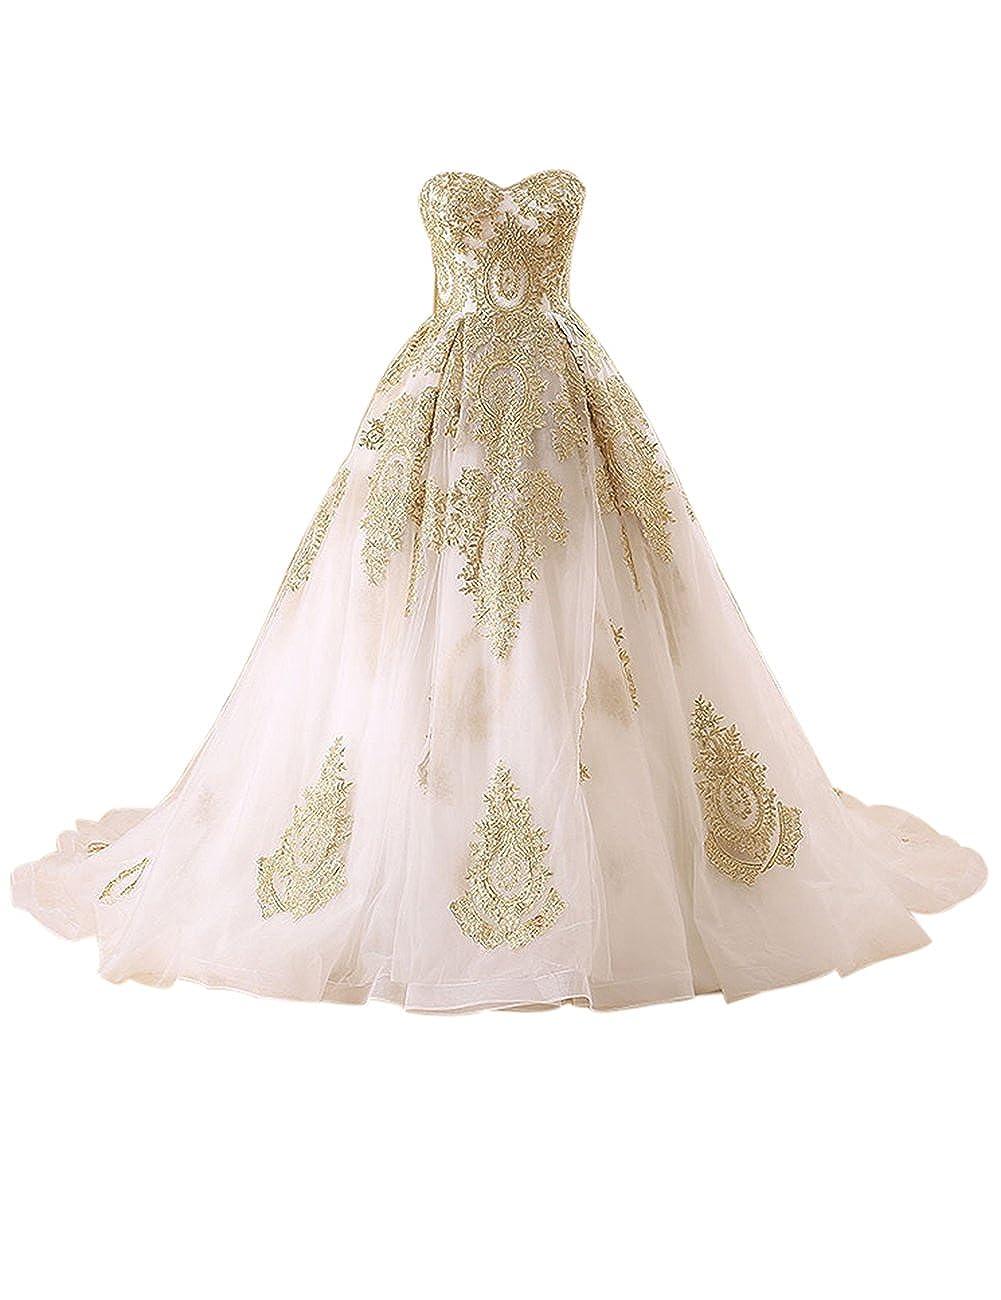 Erosebridal Lace Appliques Wedding Dress Bridal Gowns Mermaid Dress